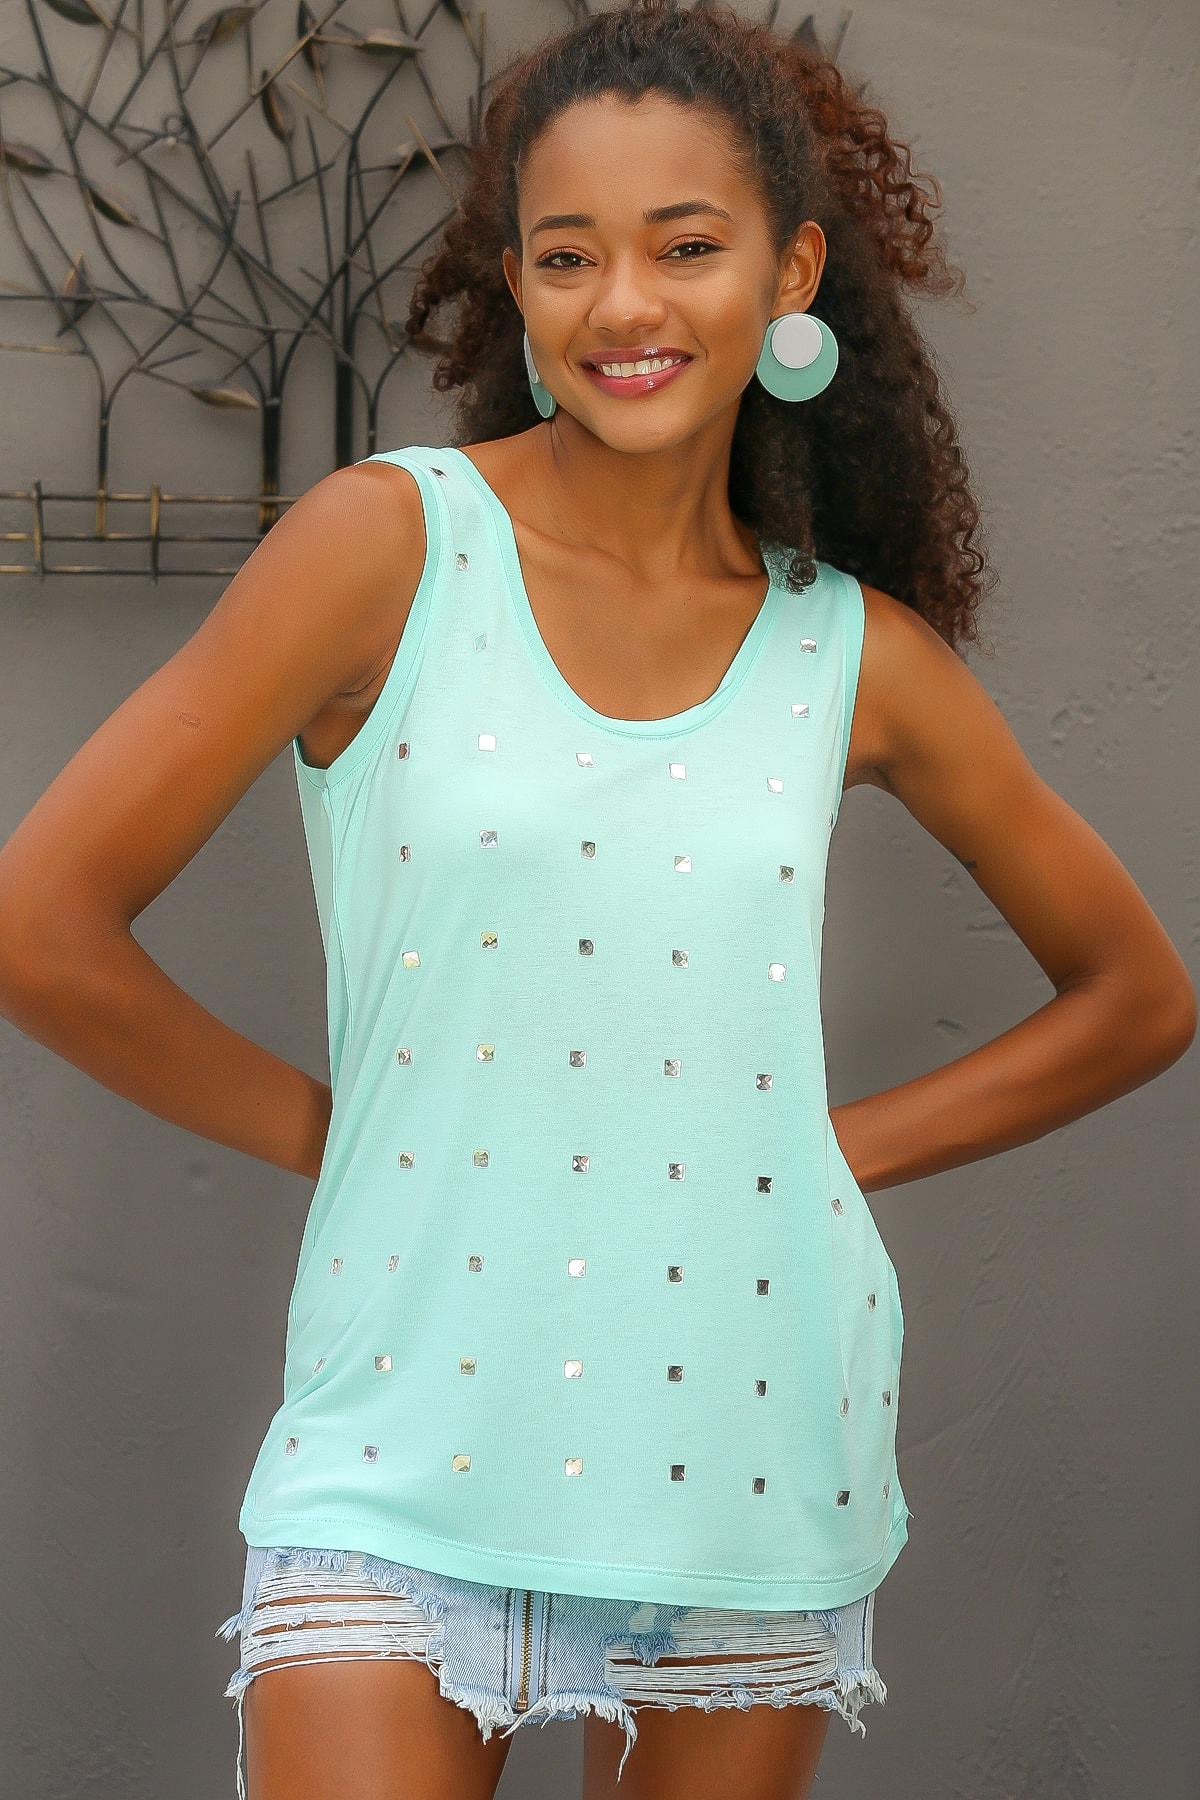 Chiccy Kadın Mint Kristal Kare Taş Detaylı Kolsuz Bluz M10010200BL95086